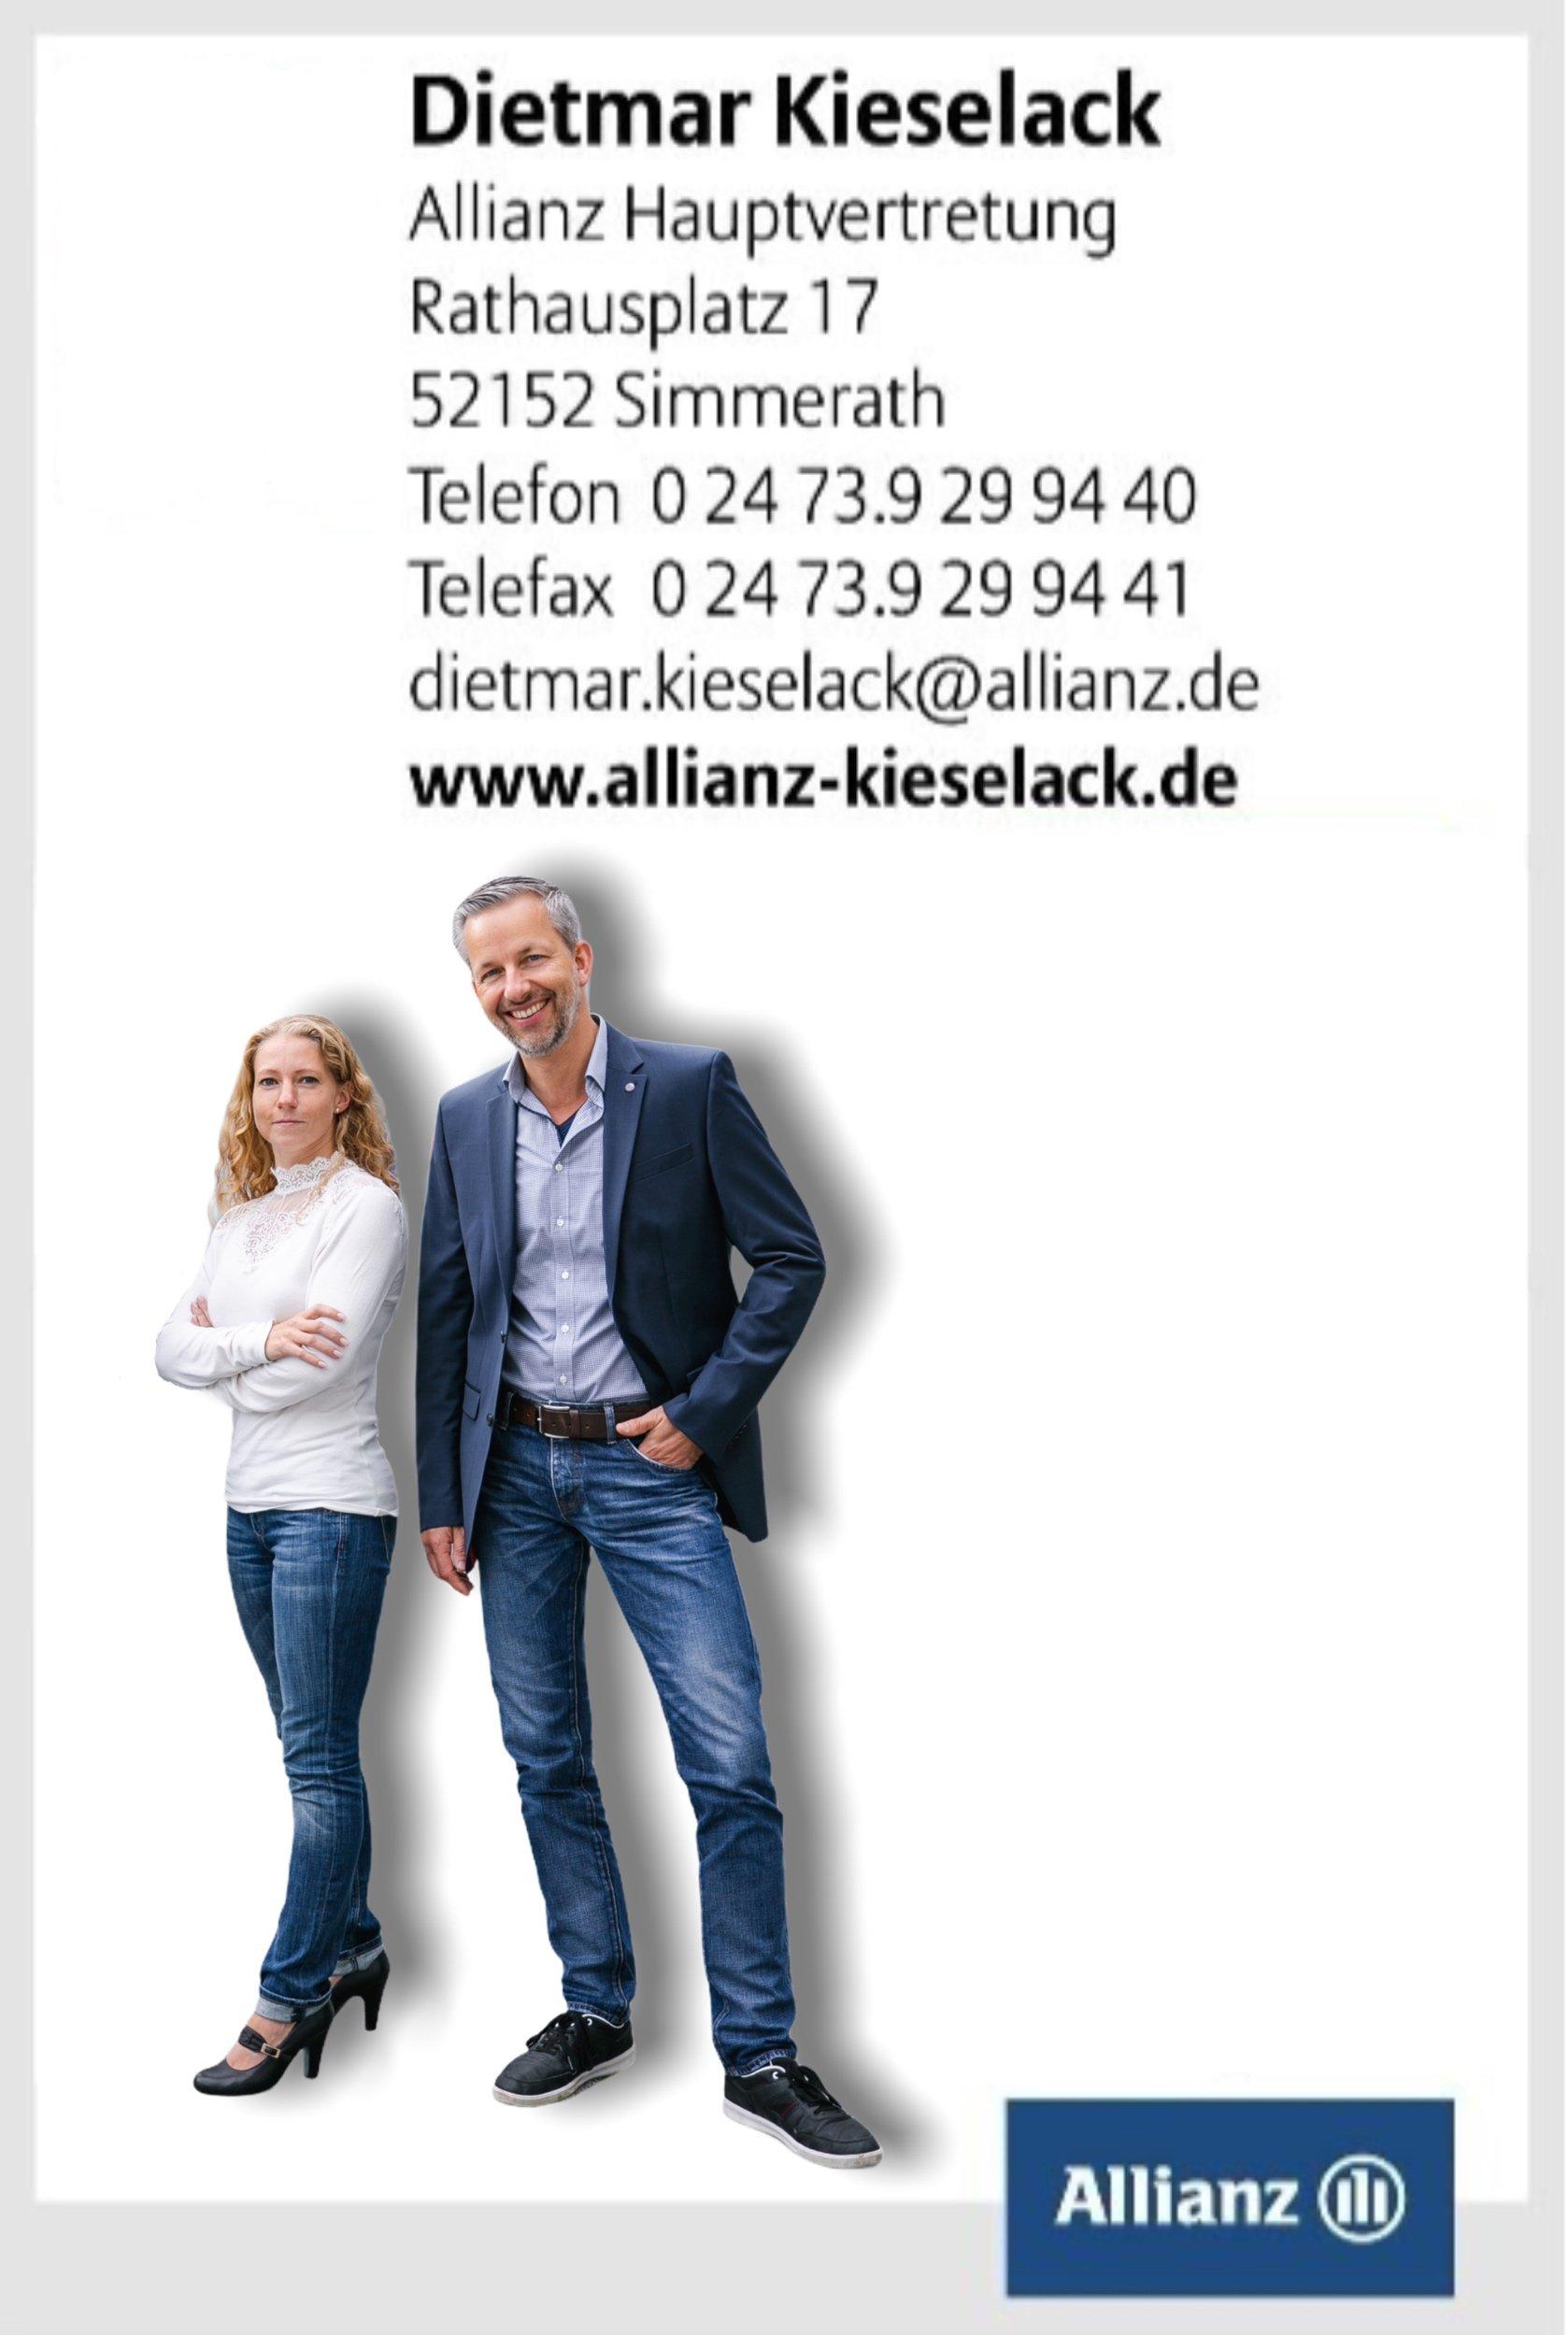 Allianz Hauptvertretung Dietmar Kieselack